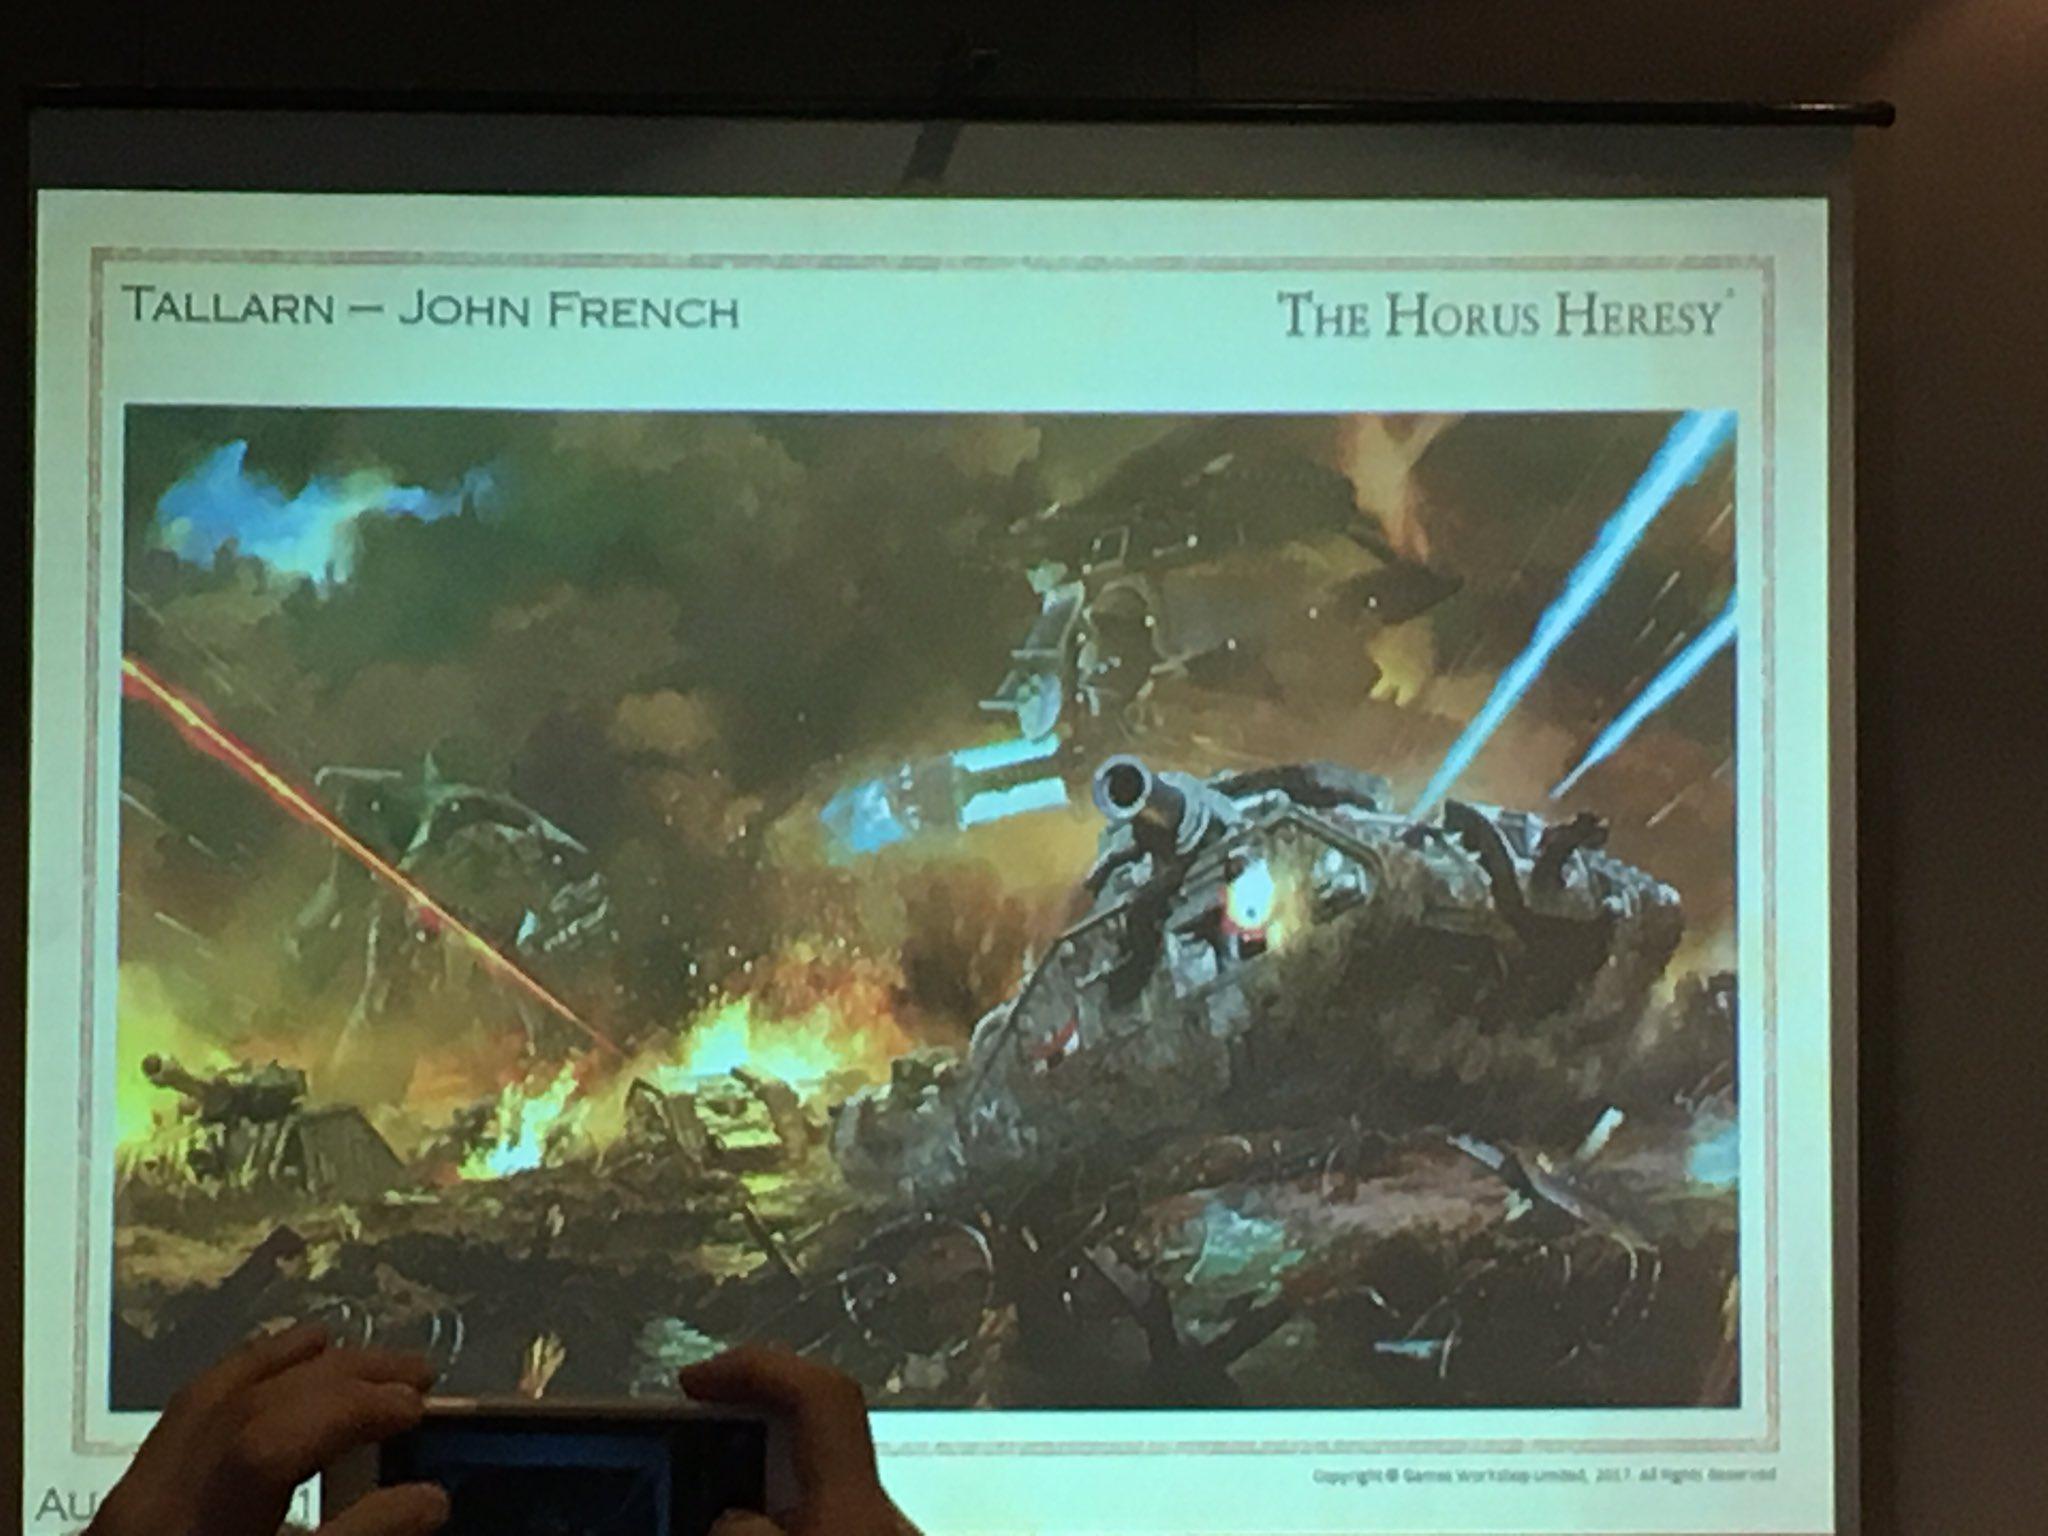 [The Horus Heresy Weekender 2017] - Centralisation des news 244846IMG20170204162509